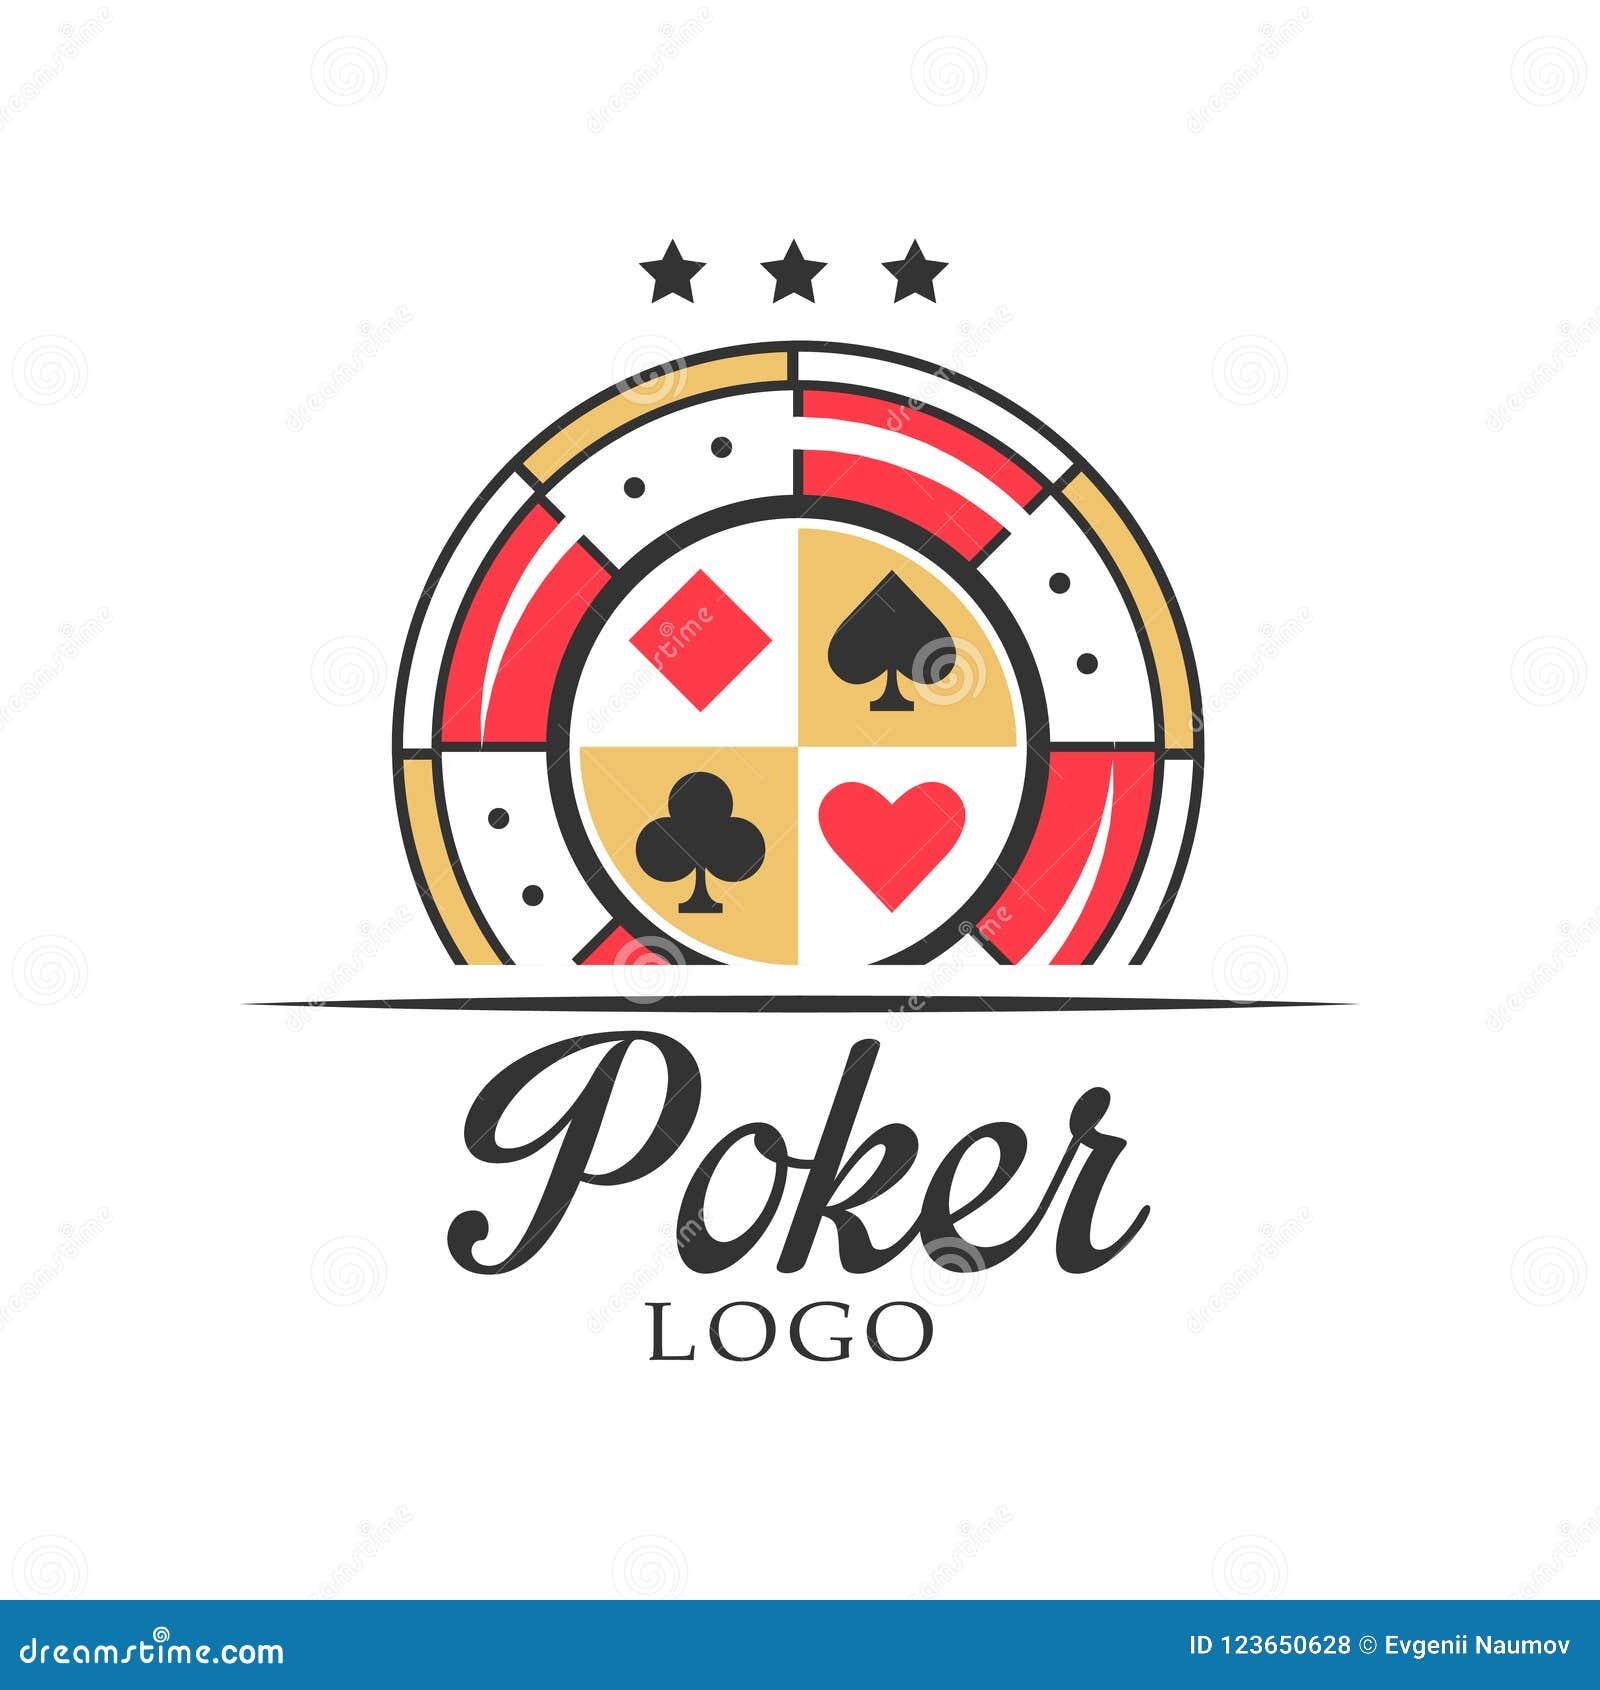 Poker Logo Vintage Emblem With Dice For Poker Club Casino Championship Vector Illustration On A White Background Stock Vector Illustration Of Design Brand 123650628